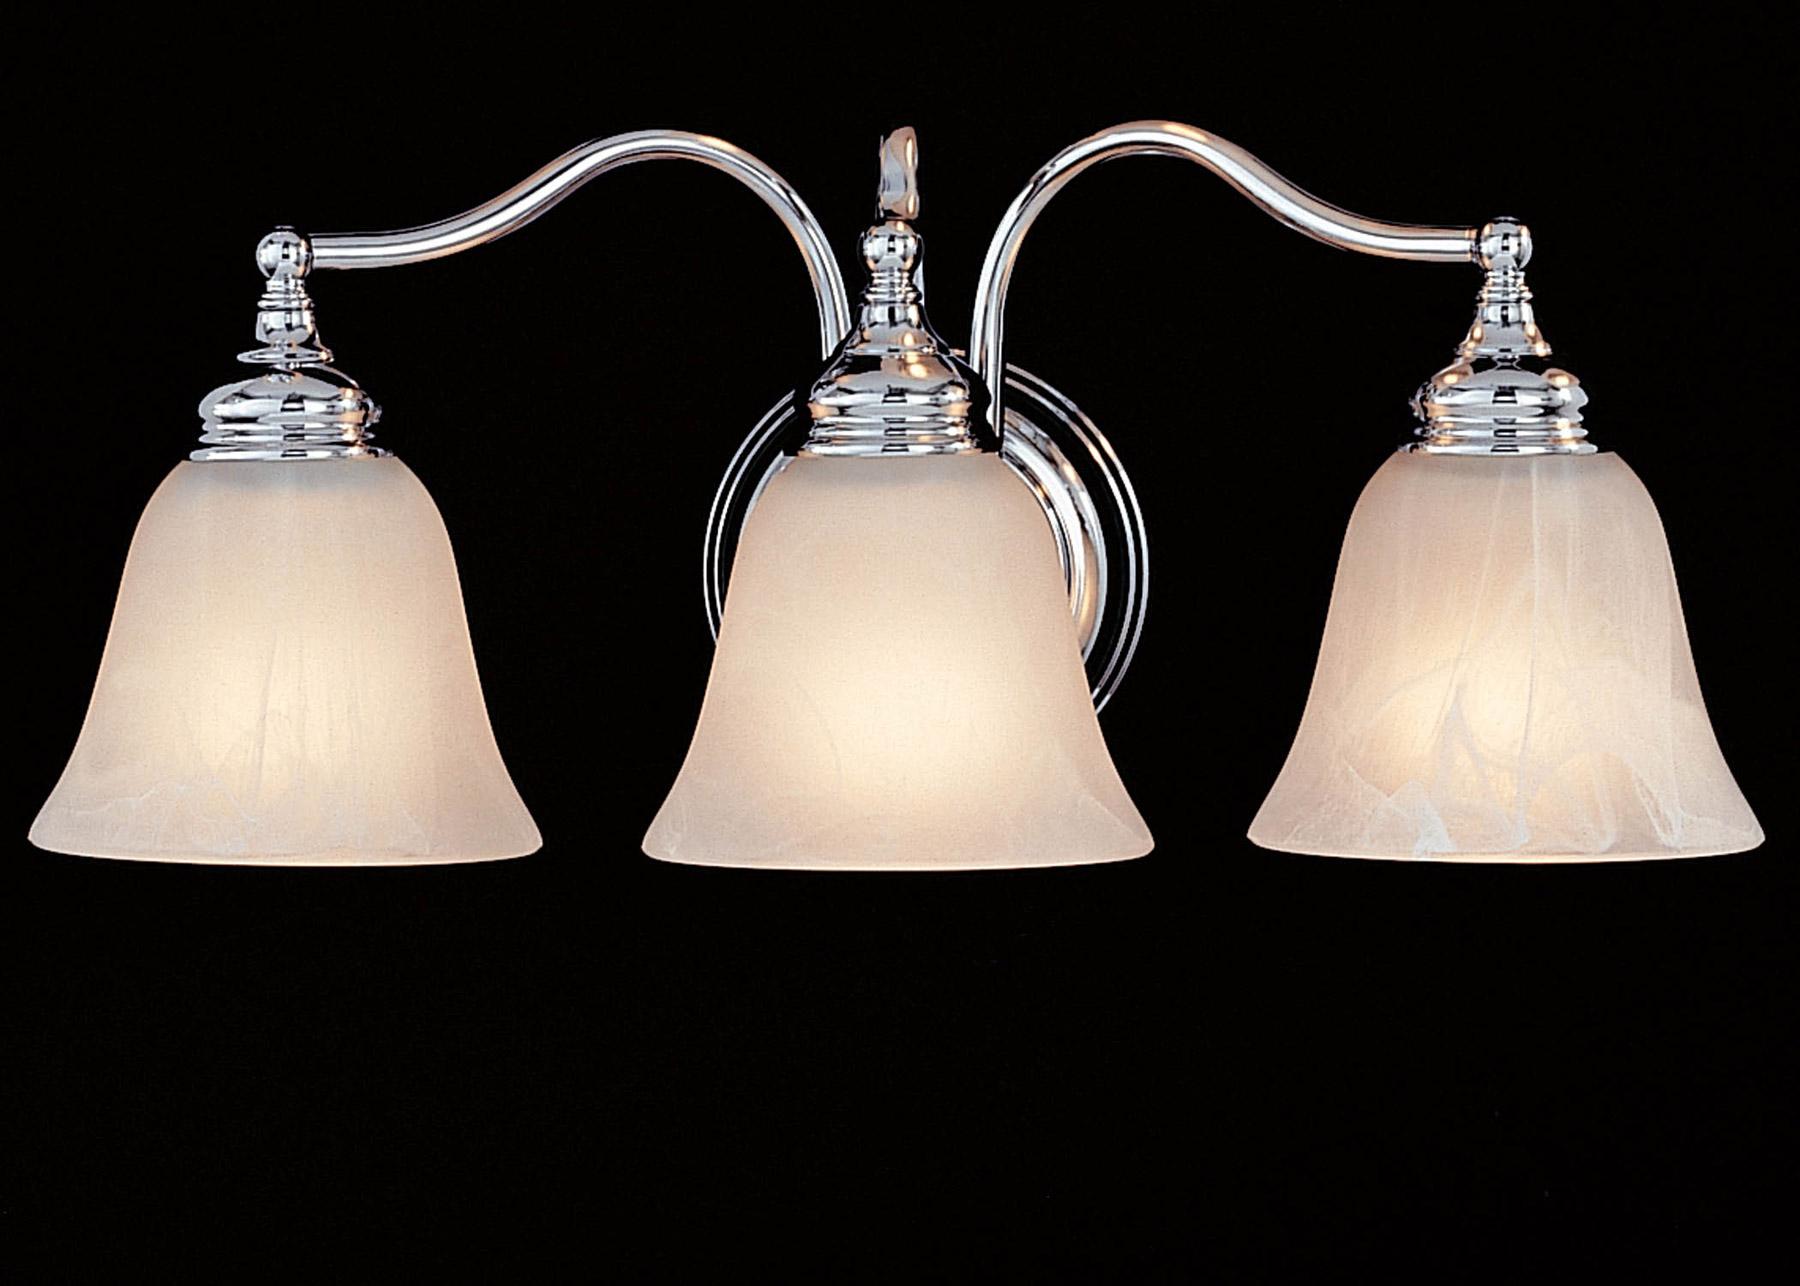 Murray feiss vs6703 ch bristol vanity light for Murray feiss bathroom lighting fixtures